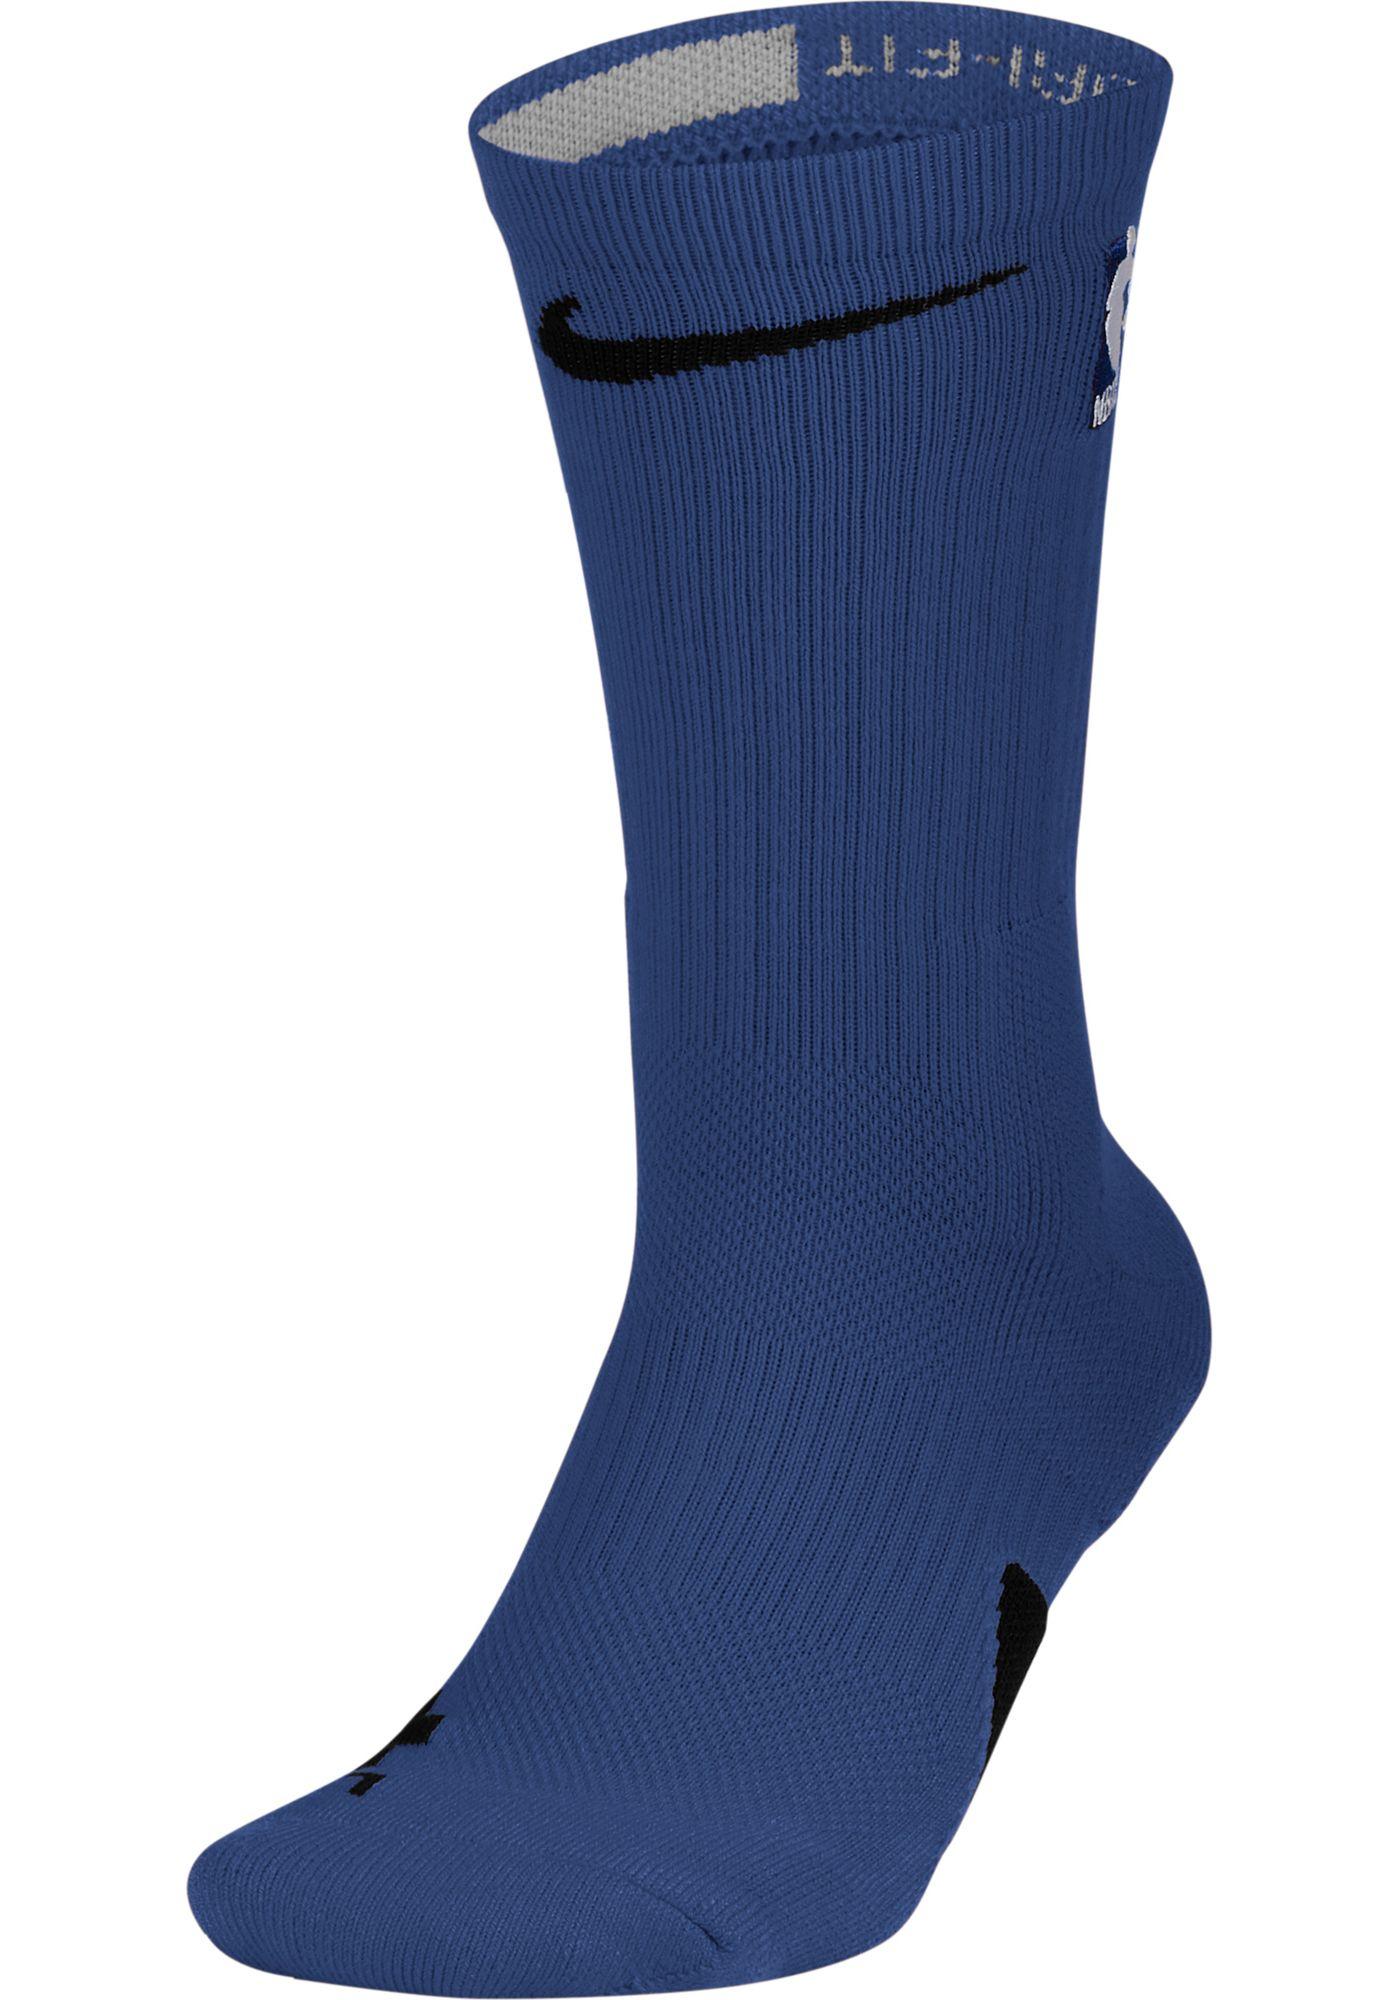 Nike NBA League Dark Blue Elite Crew Socks